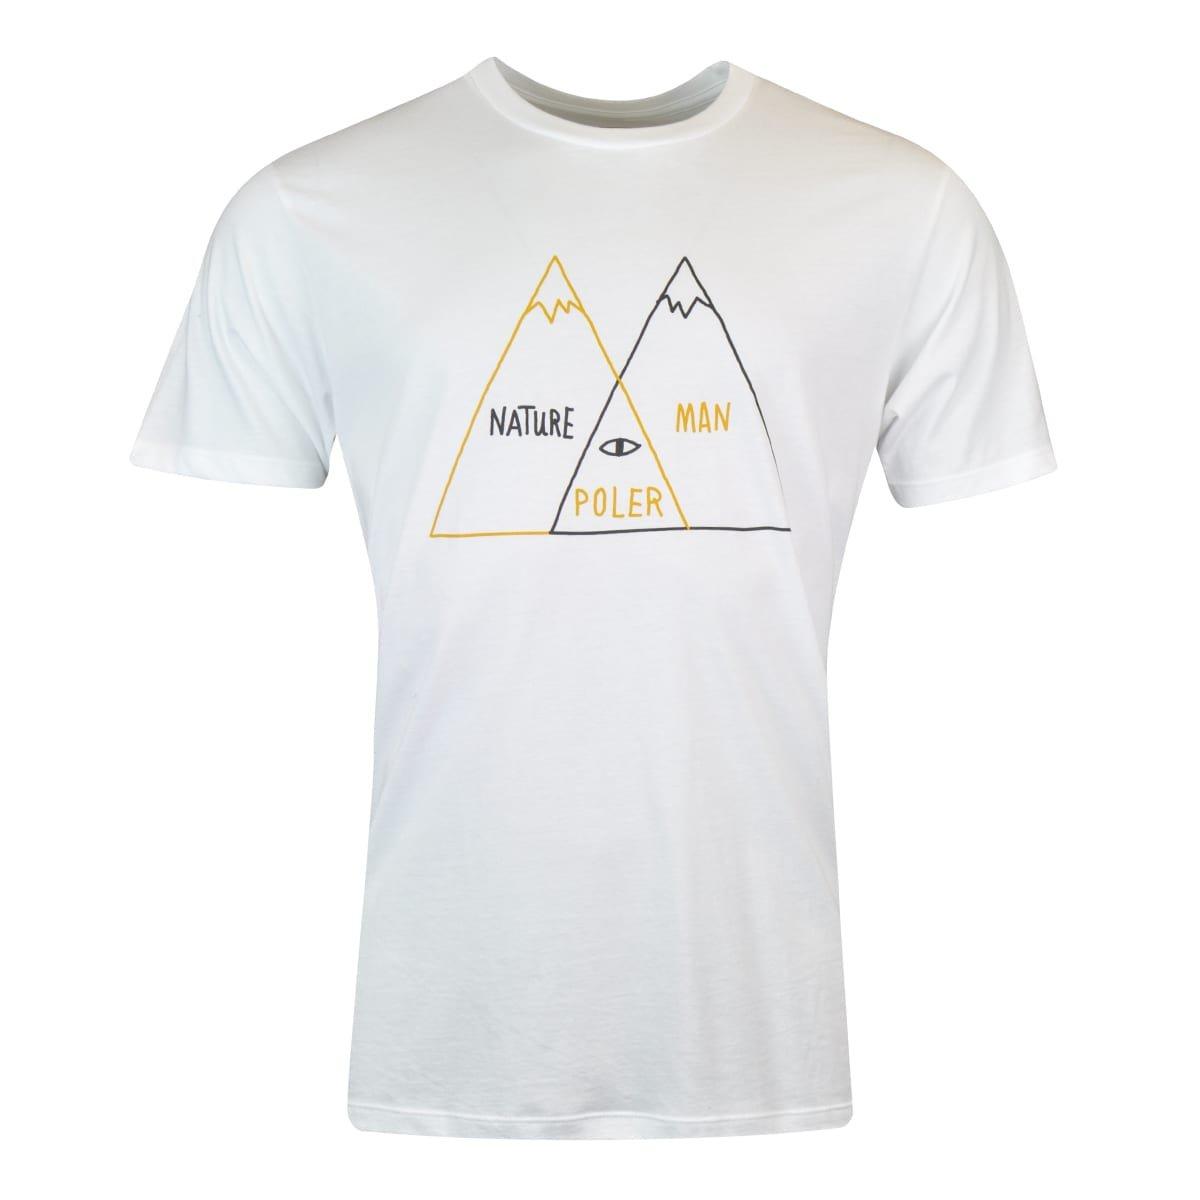 Poler venn diagram t shirt the sporting lodge poler venn diagram t shirt pooptronica